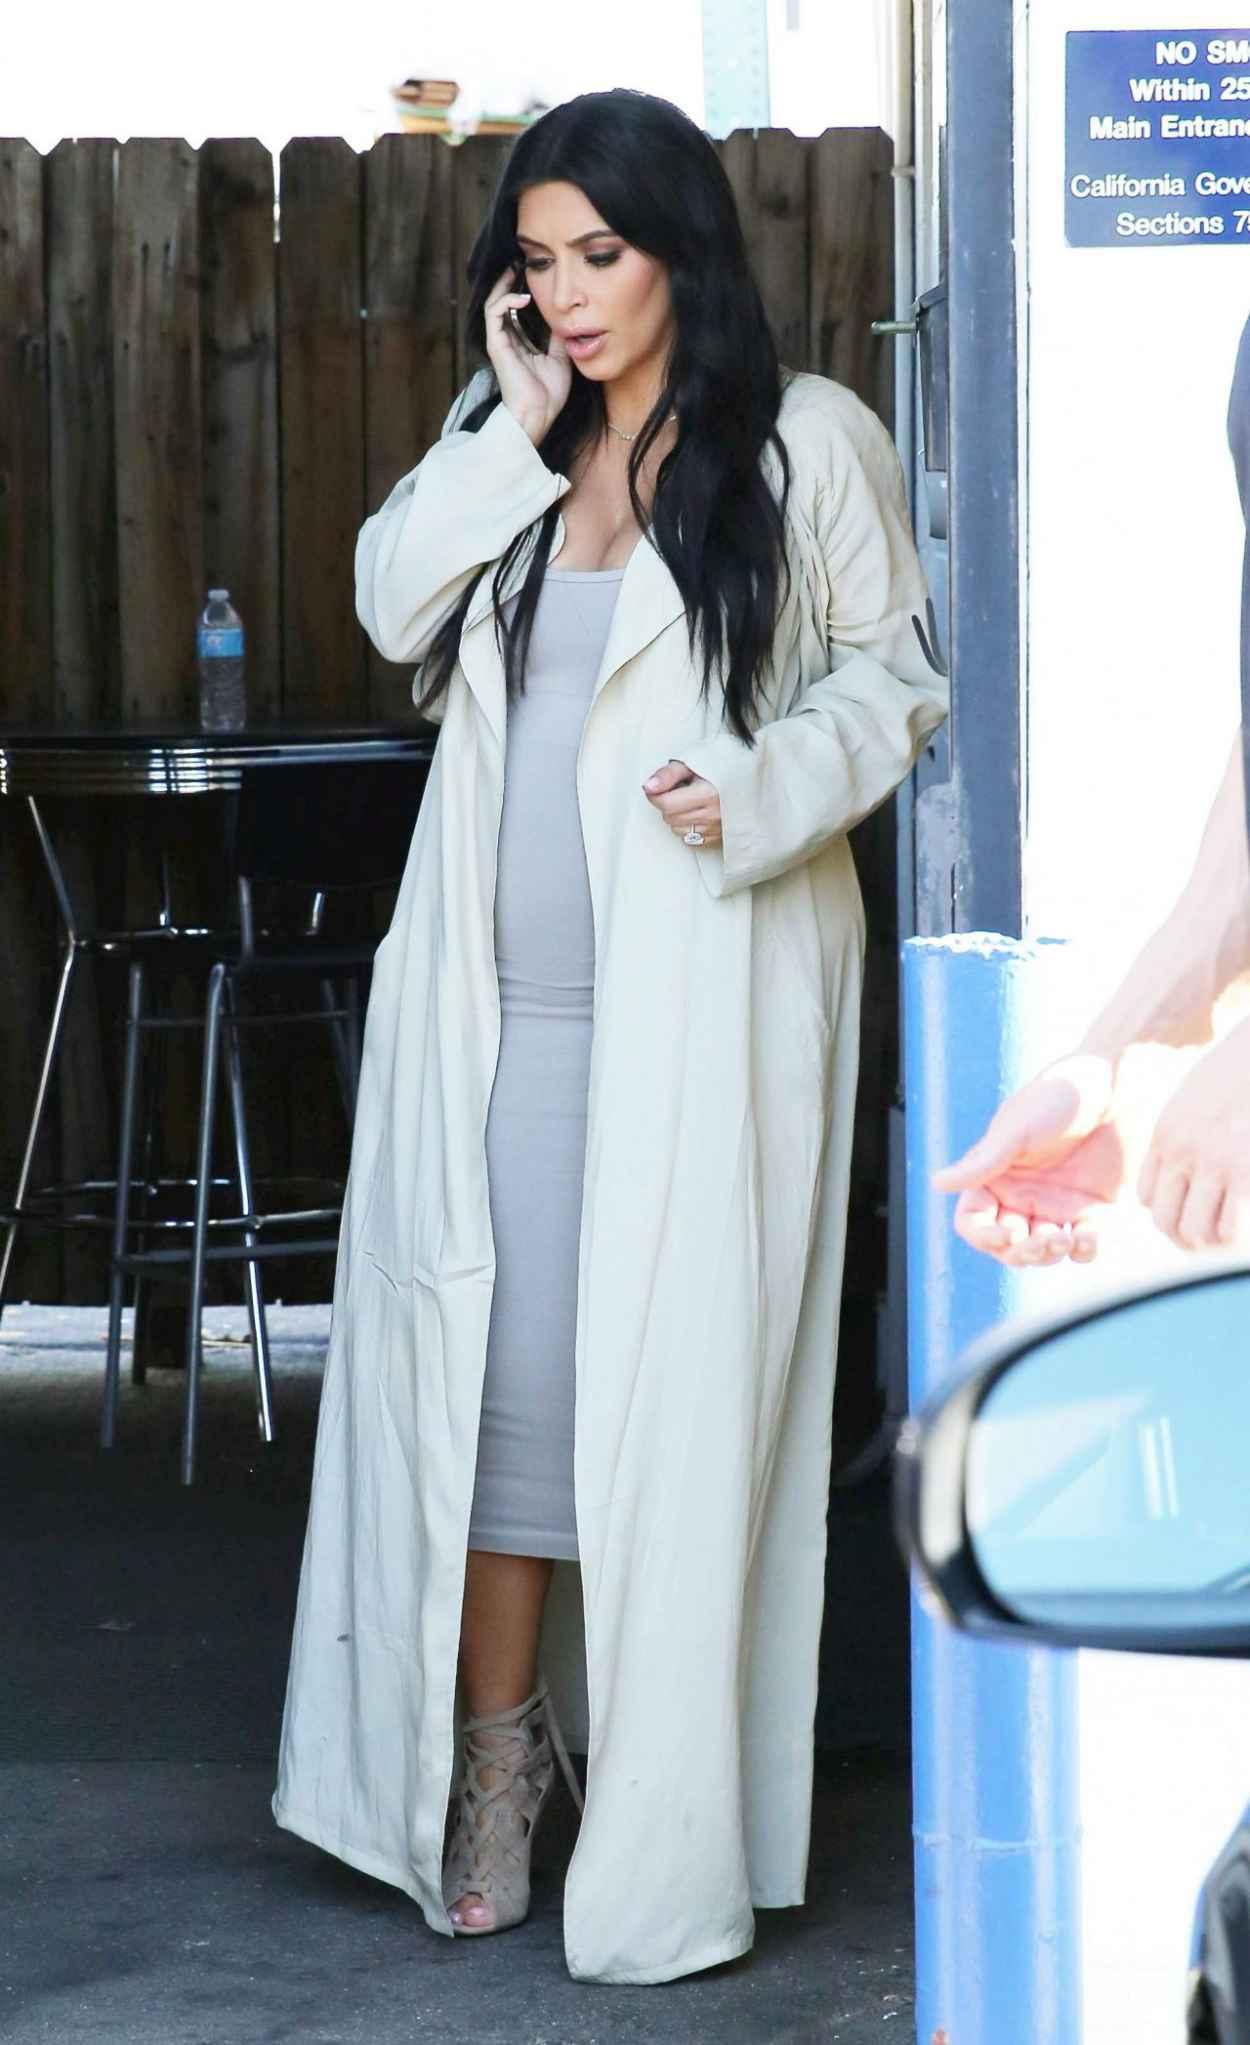 Kim Kardashian Street Fashion At A Studio In Los Angeles